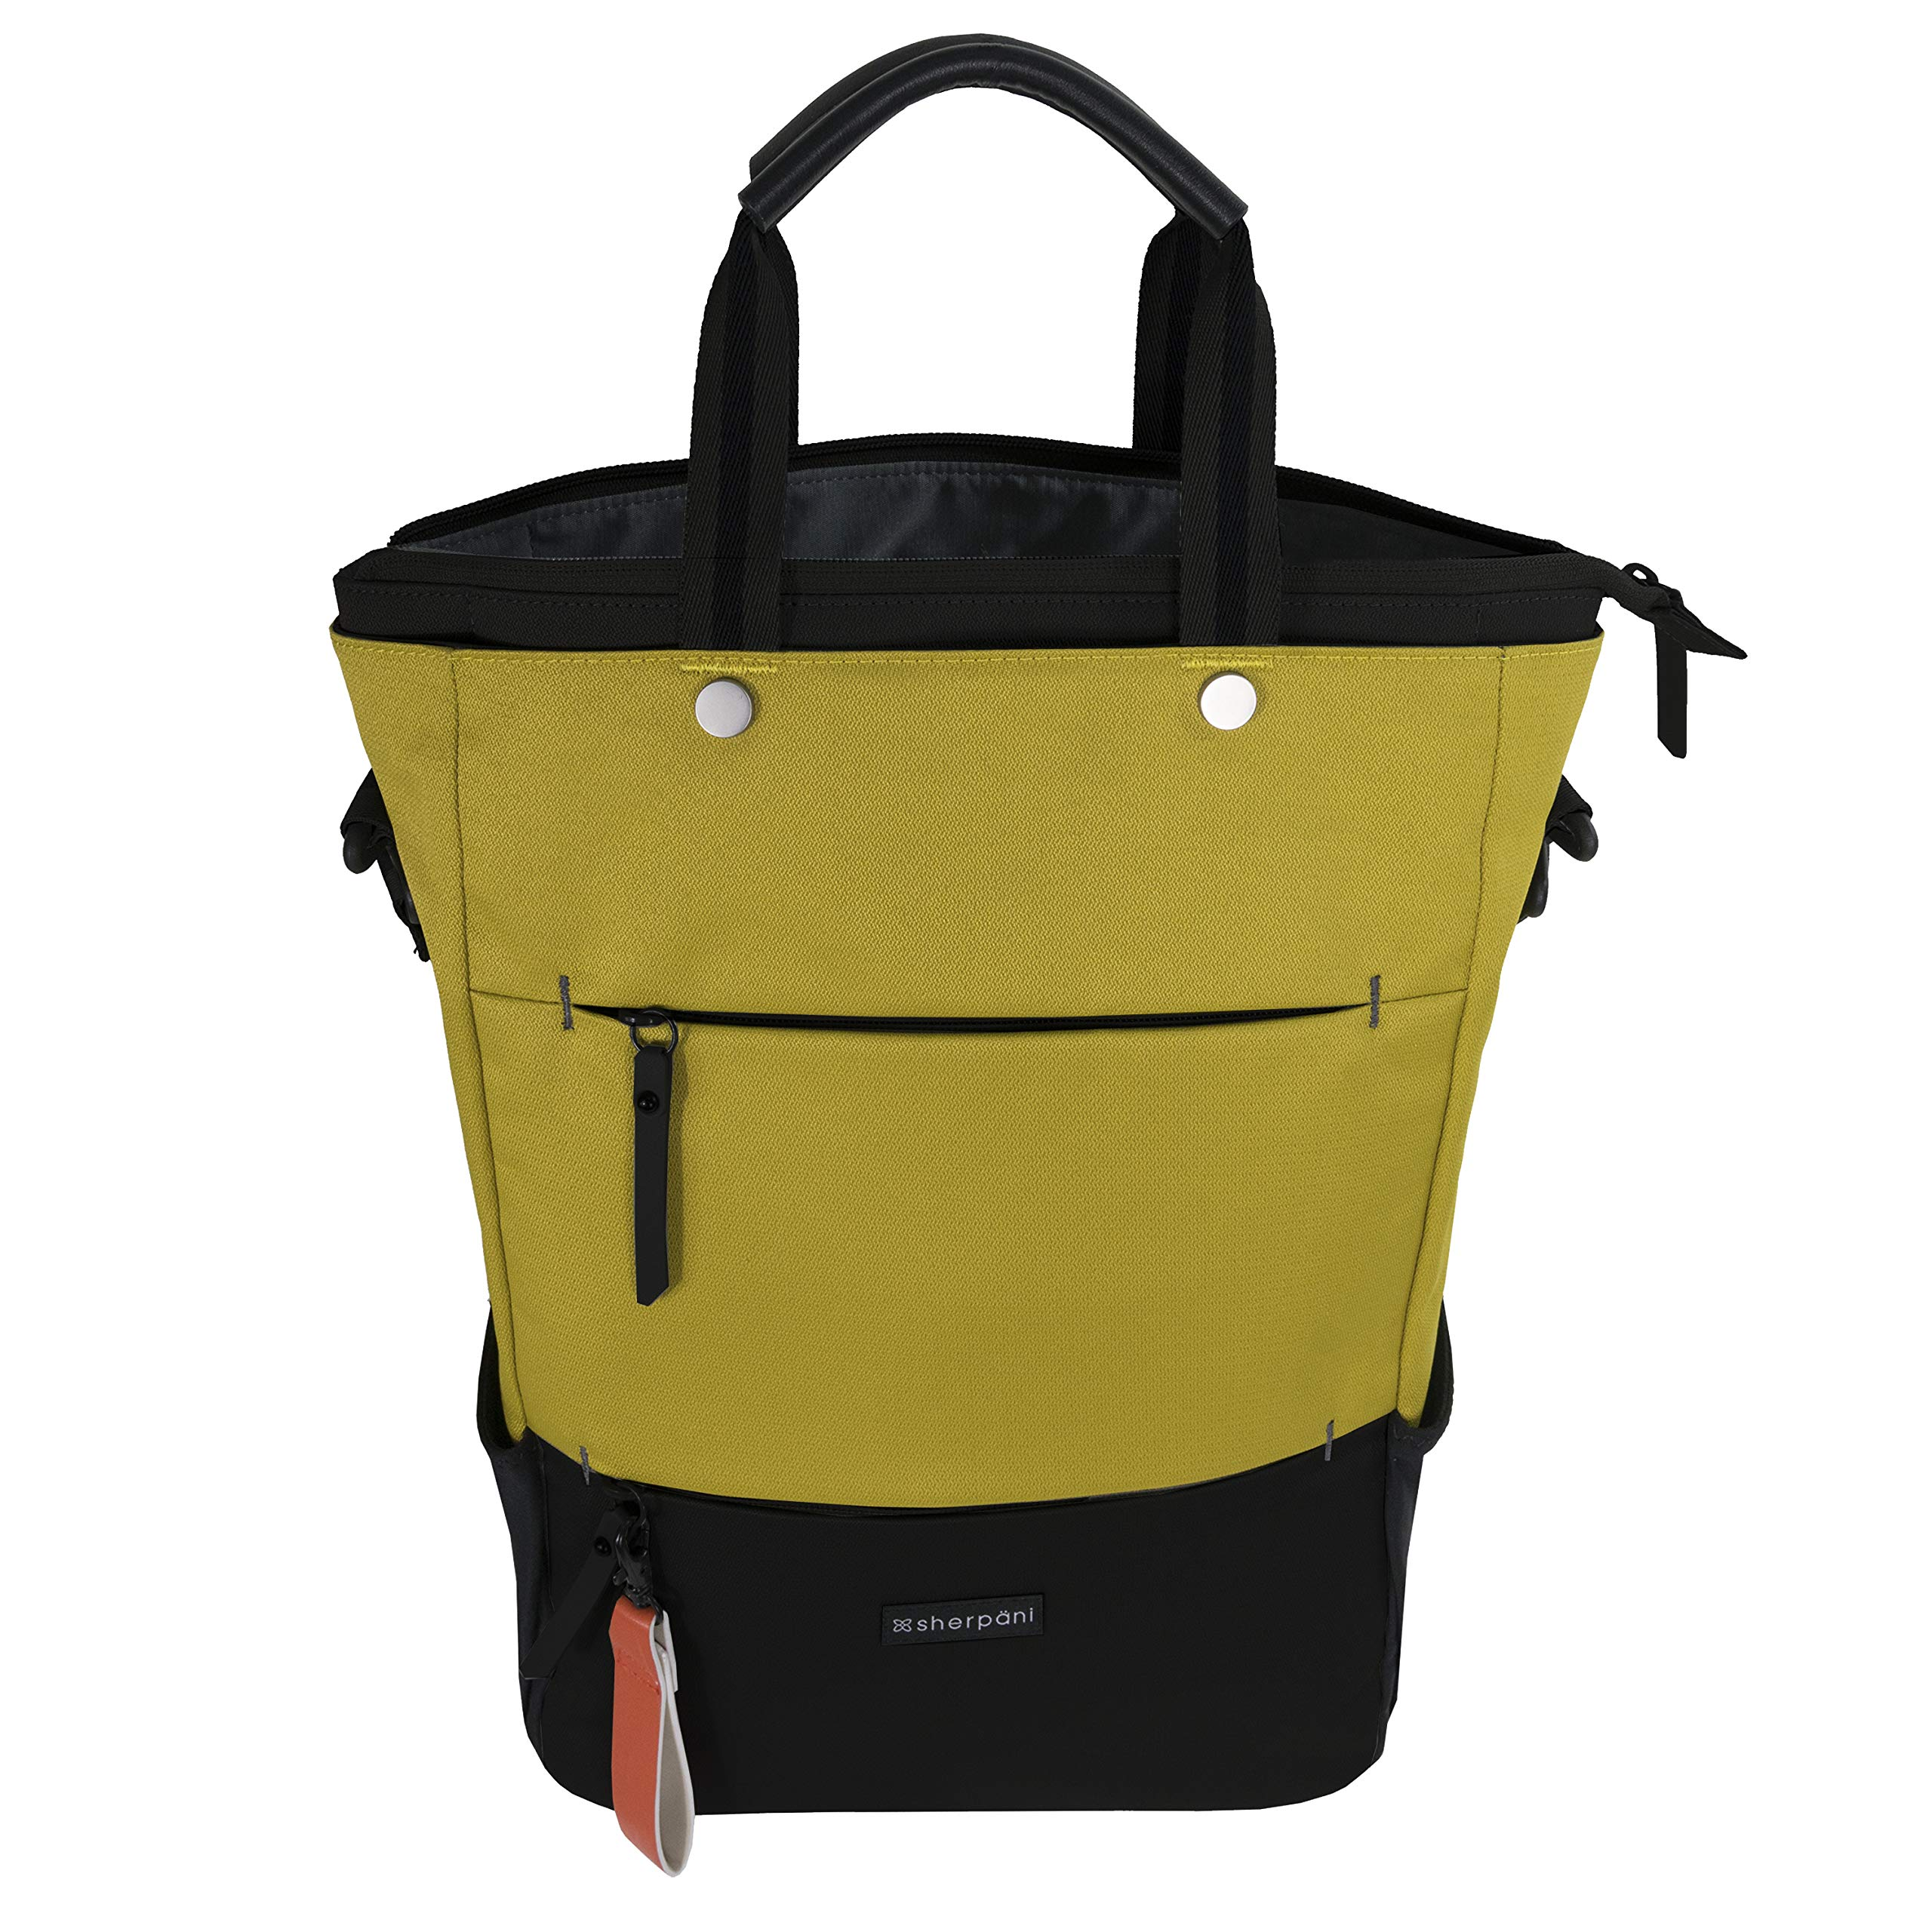 95896fc4b8 Galleon - Sherpani Women's RFID Camden Tote/Backpack/Crossbody Travel,  Saffron, One Size